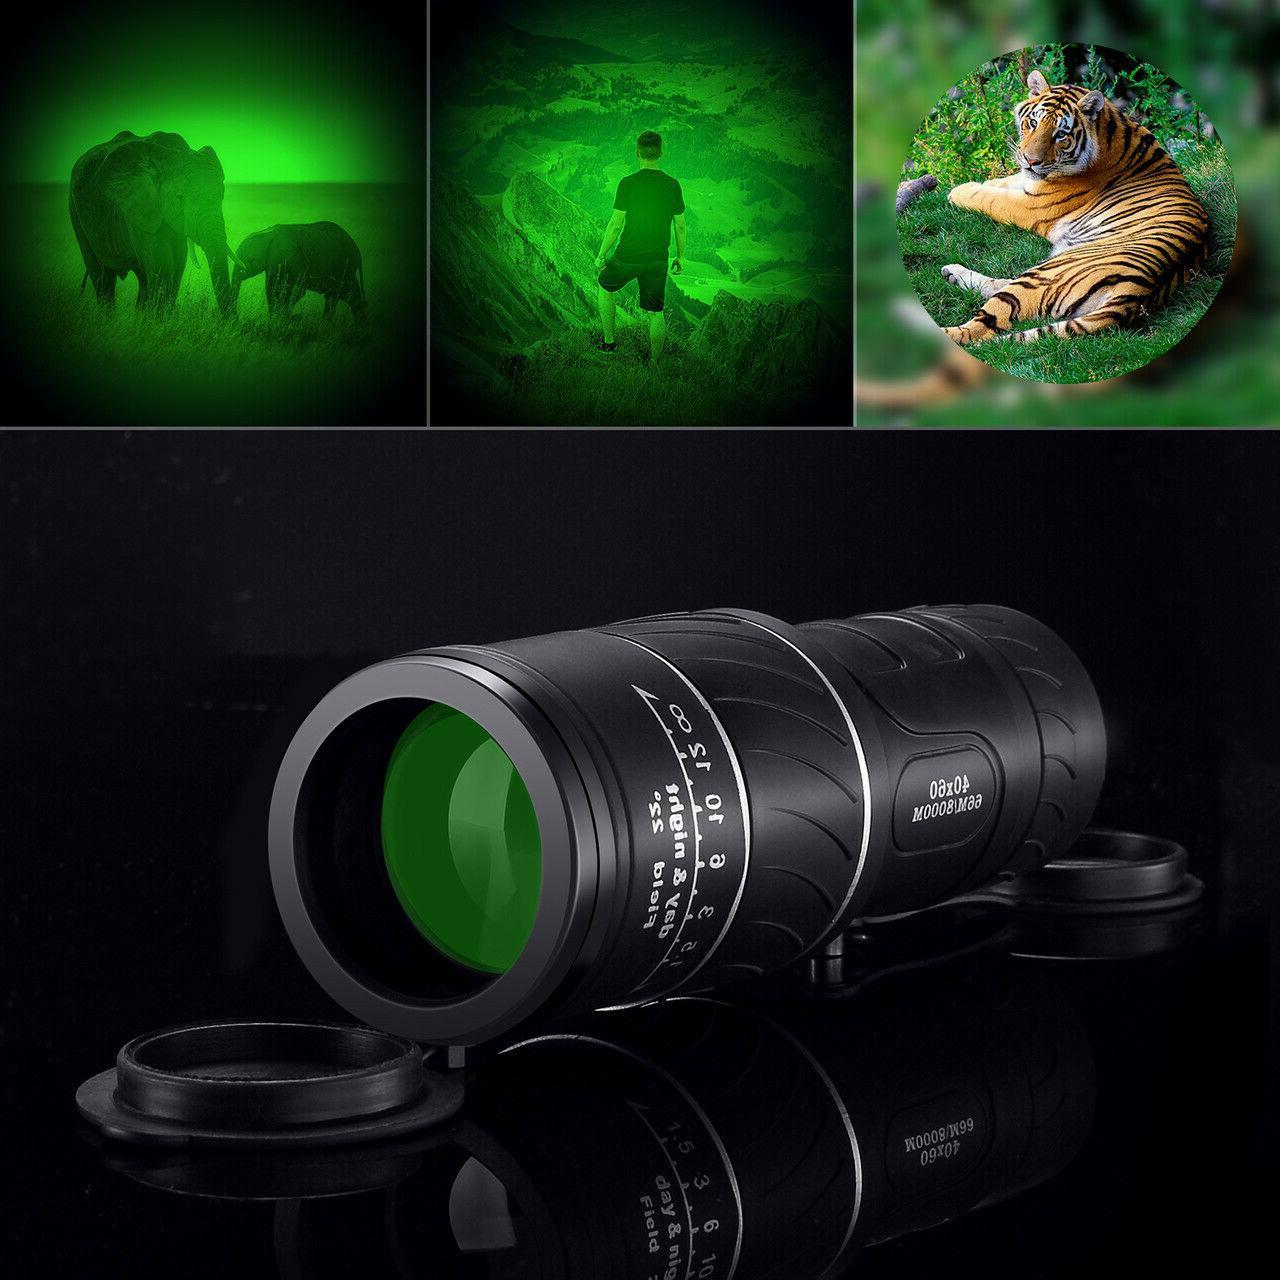 Day Night 40*60 Zoom Hunting Binoculars Powerful BAK-4 Hunti